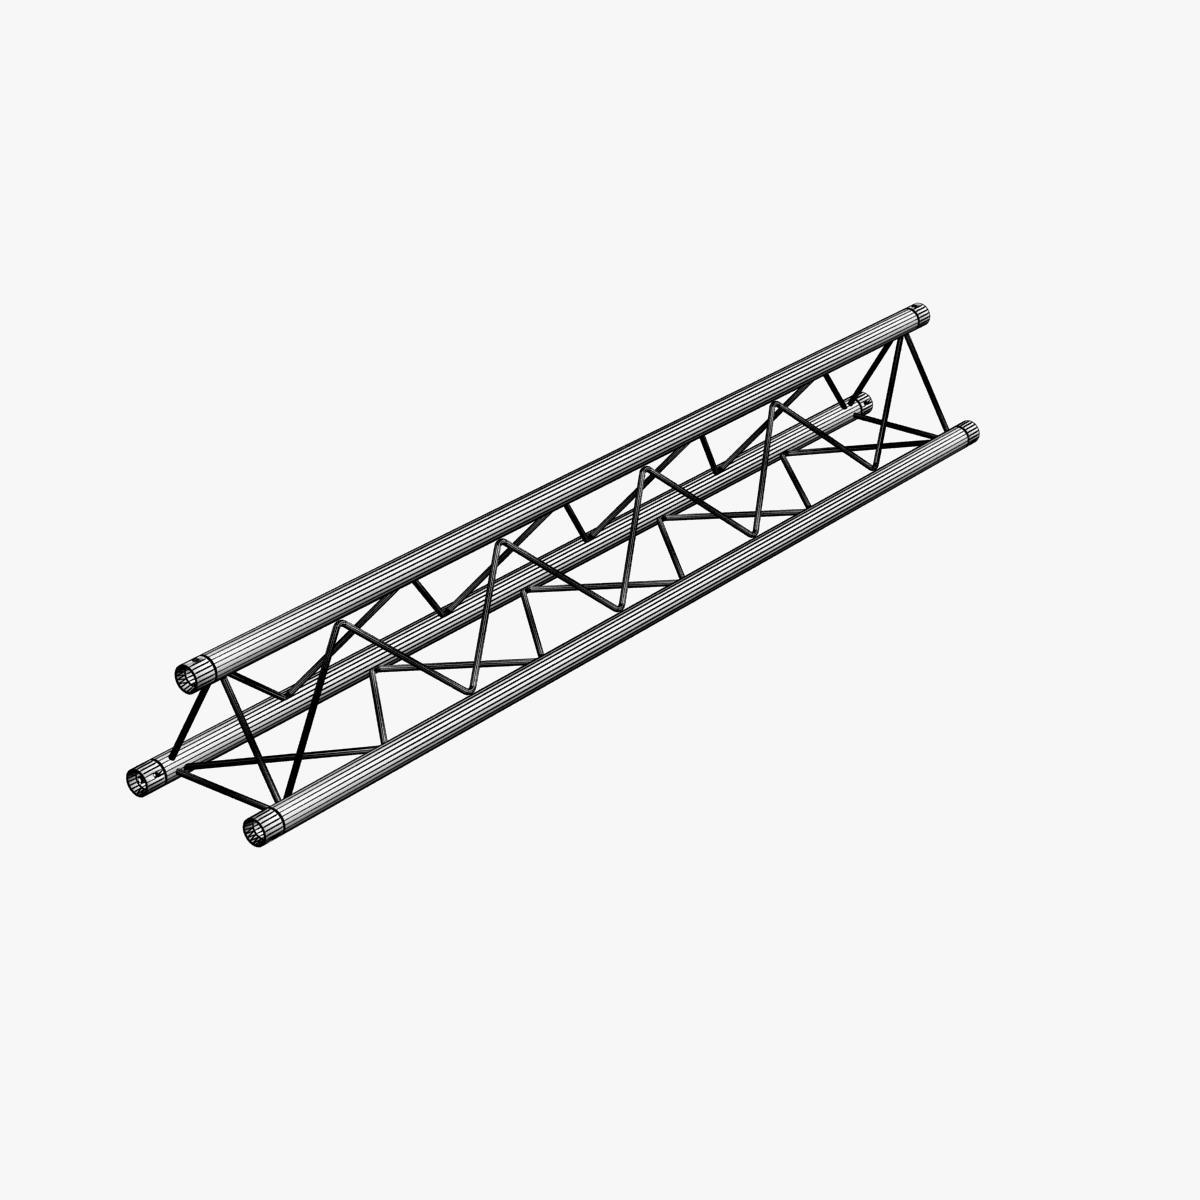 Mini triangular truss collection 14 modular 3d model for Buy truss